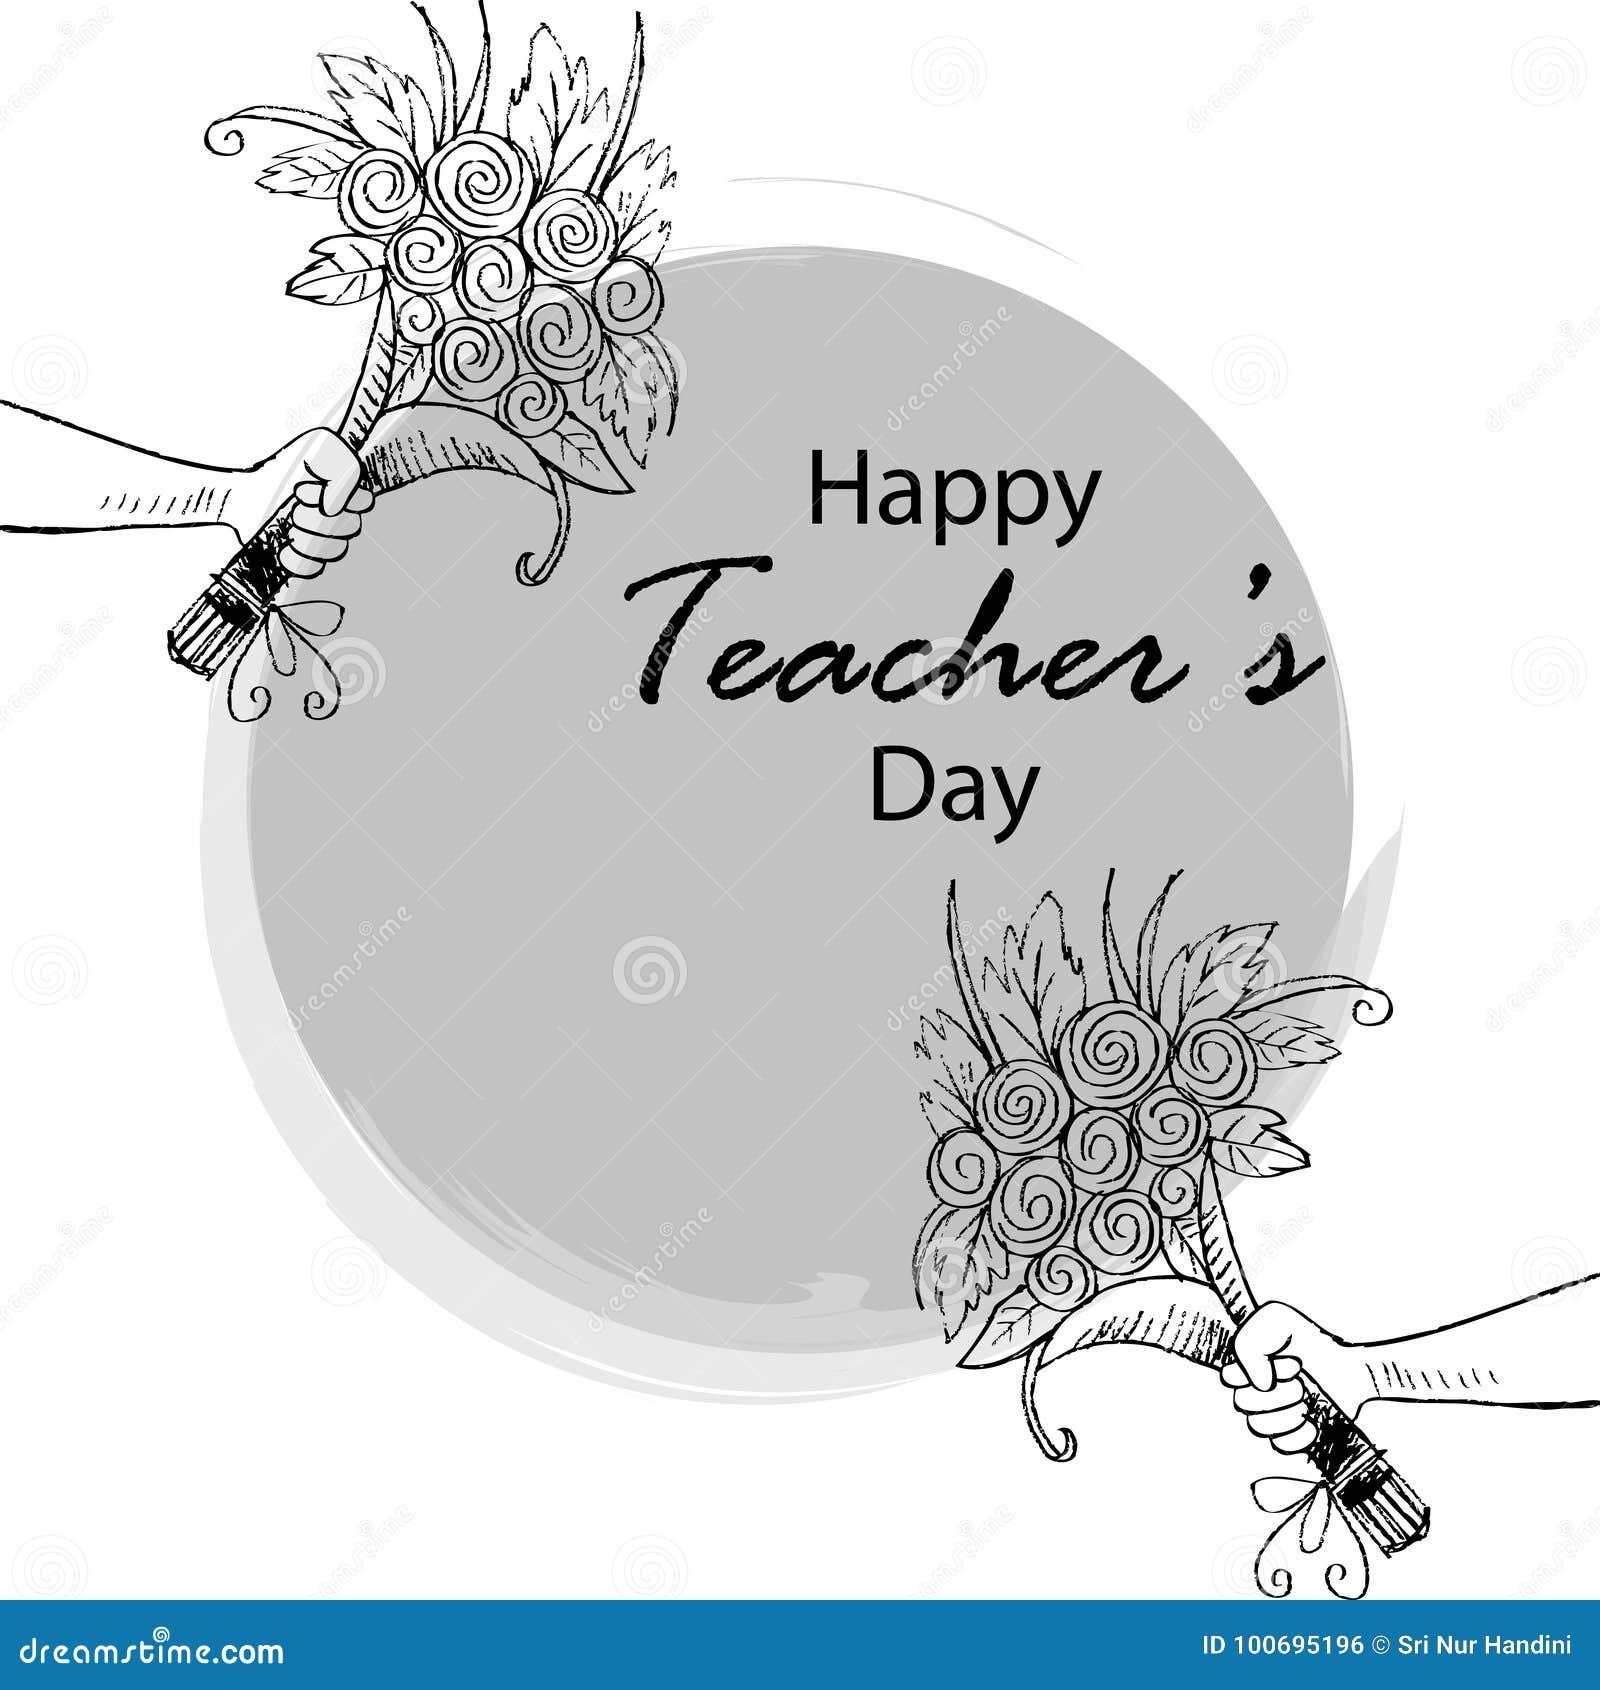 Happy teachers day card stock vector. Illustration of happy